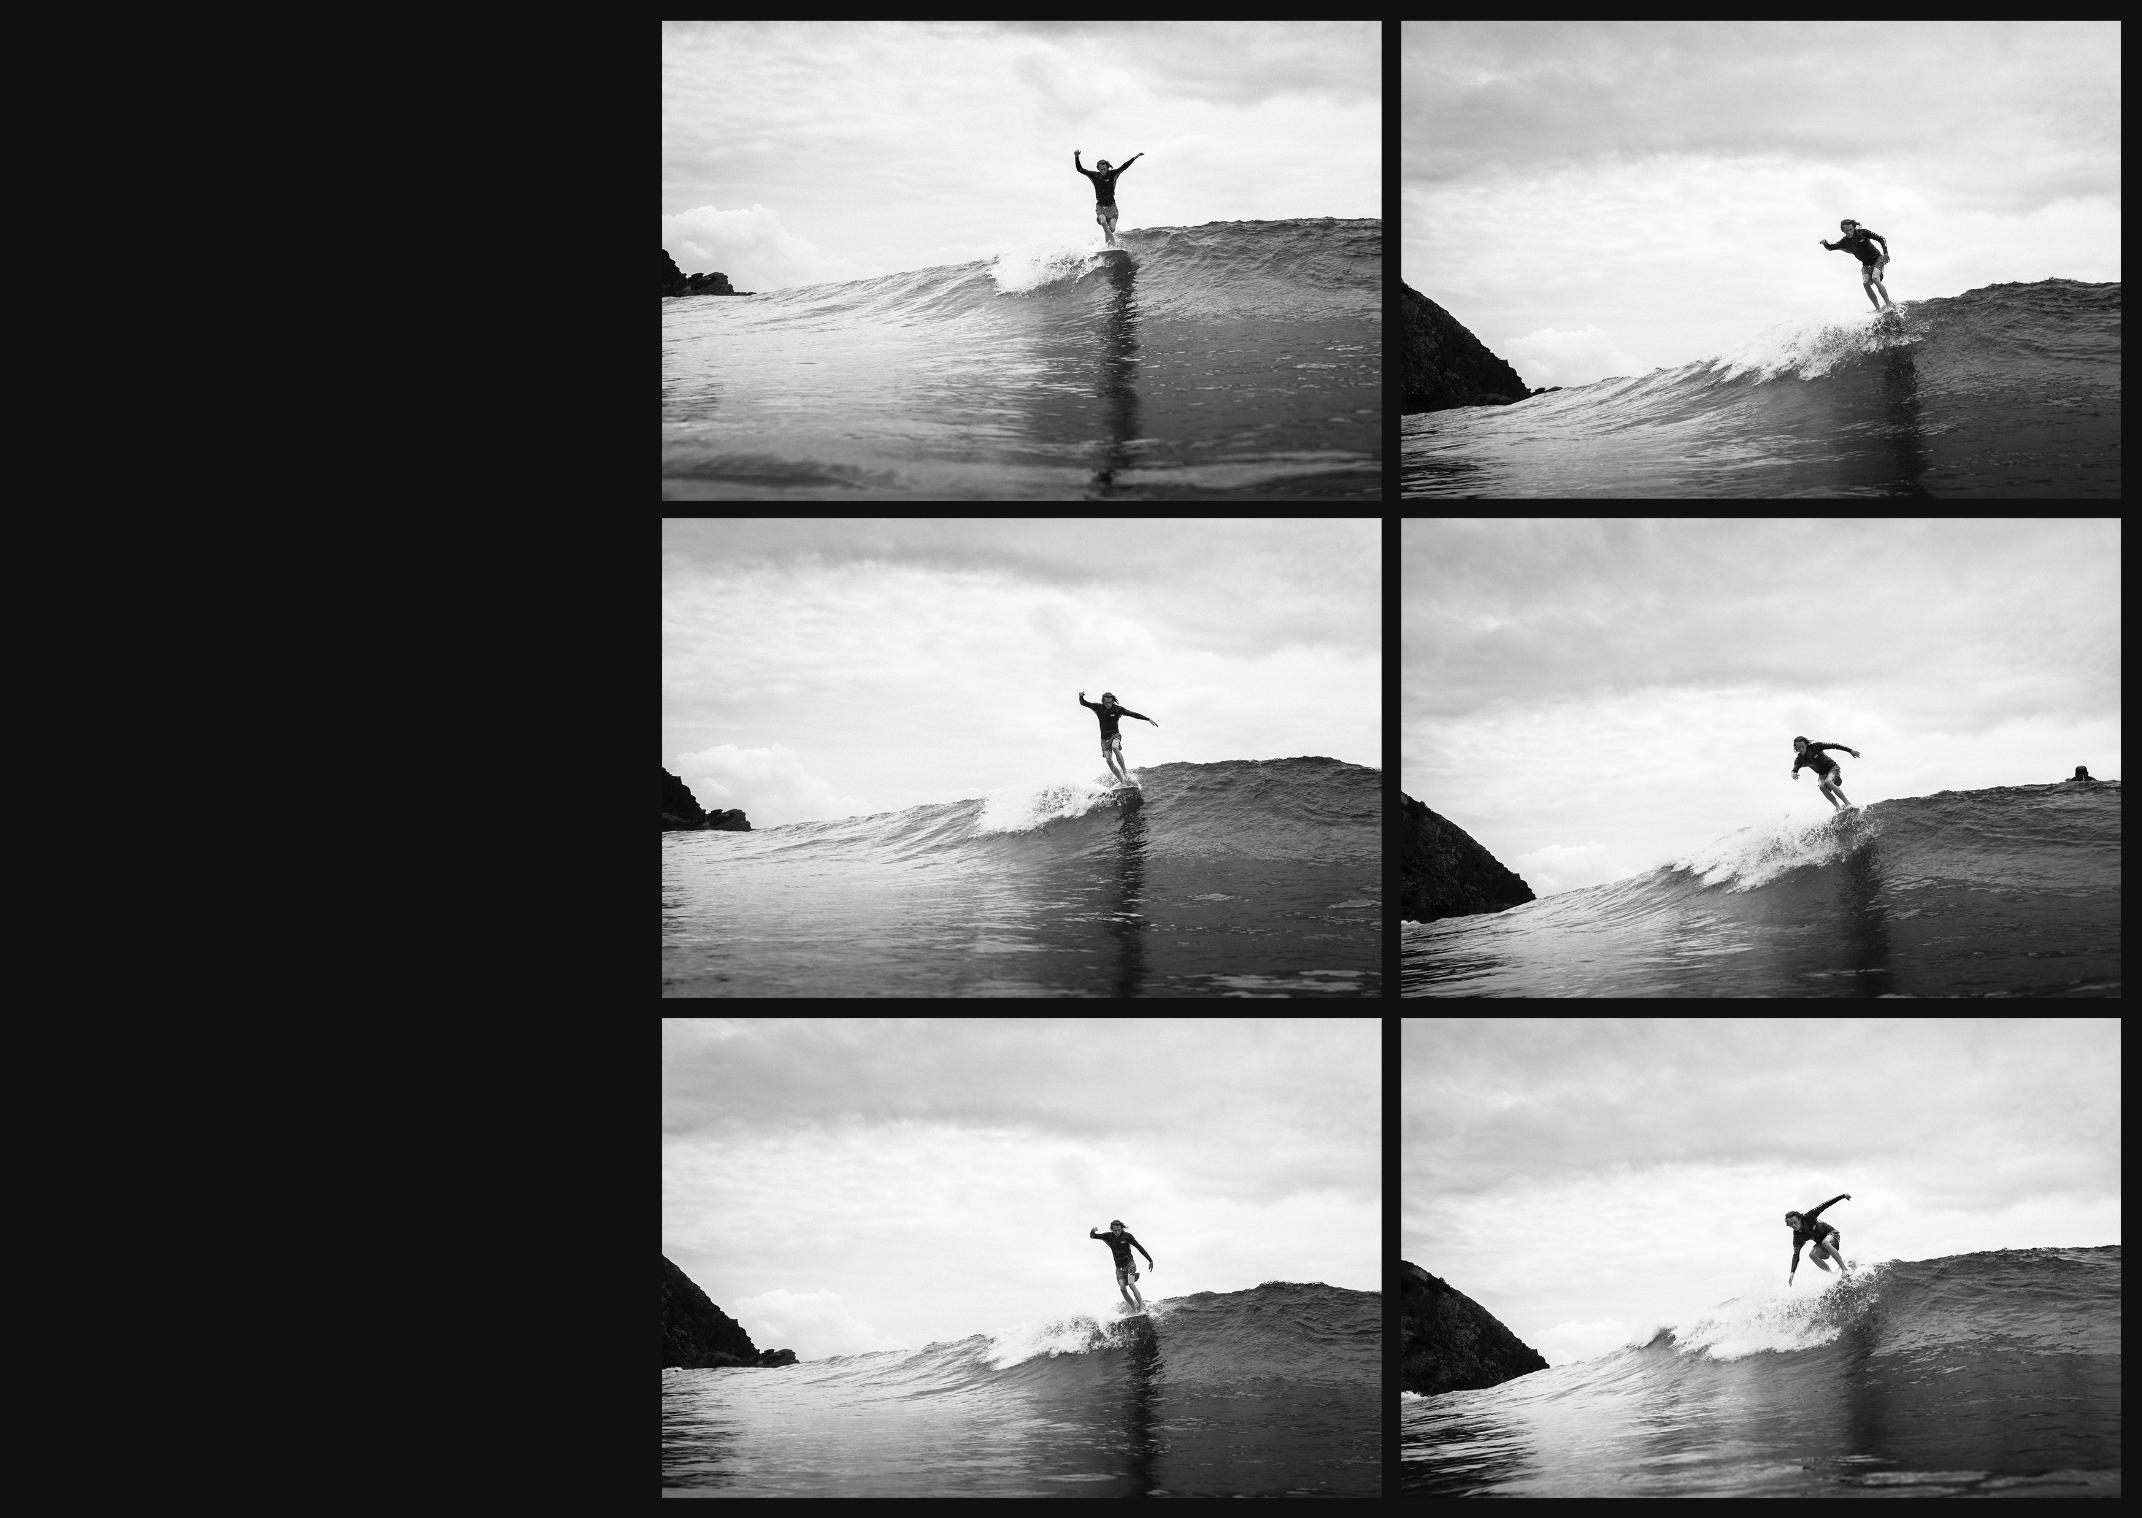 Fabien_voileau_salt_water_byron_bay_surf_Jye_whyatt_12